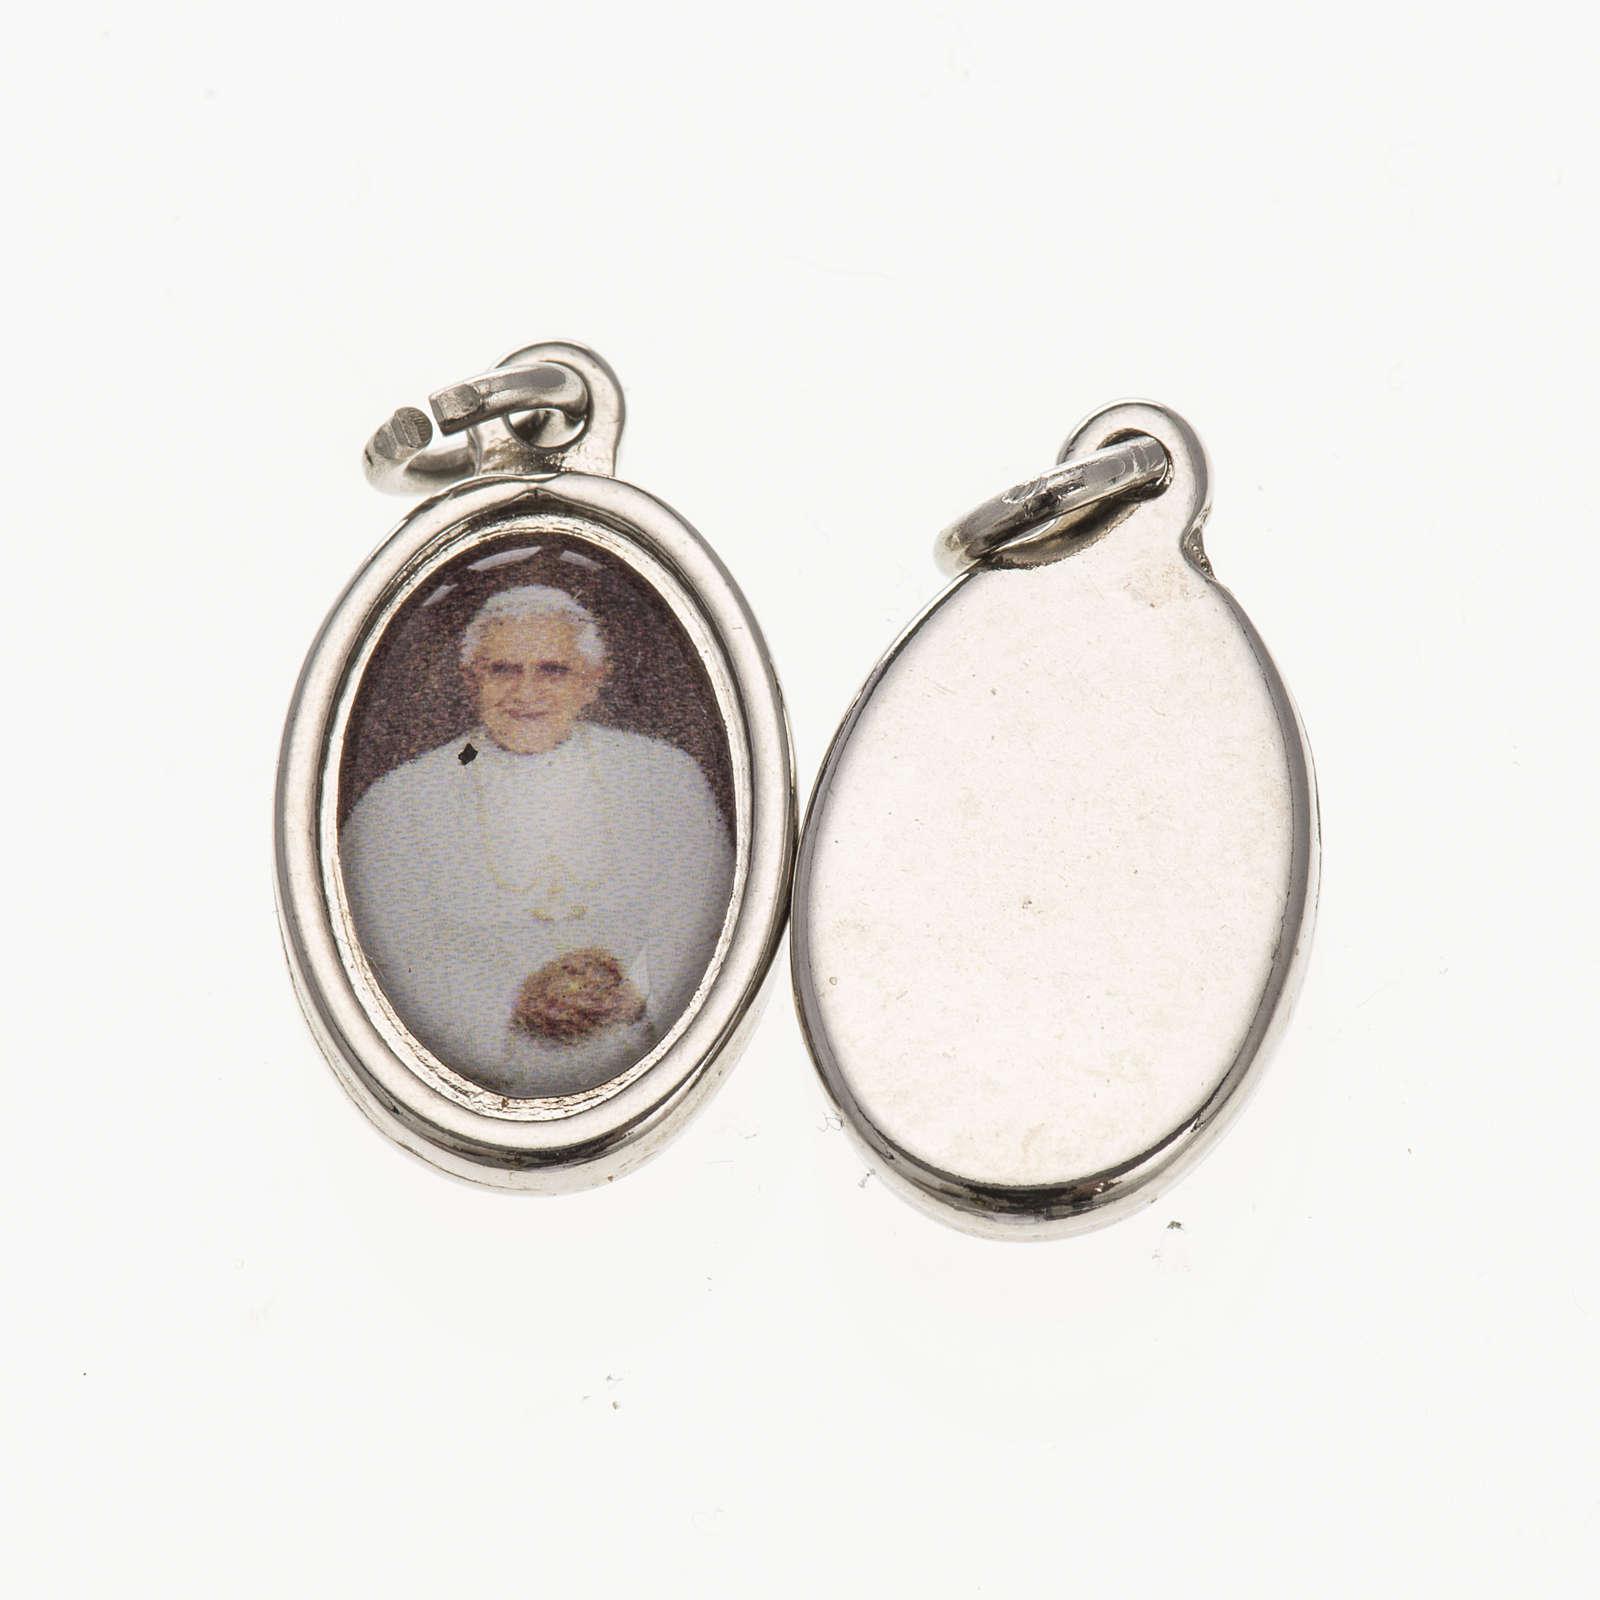 Medaglia Benedetto XVI - metallo argentato resina 1,5x1 cm 4